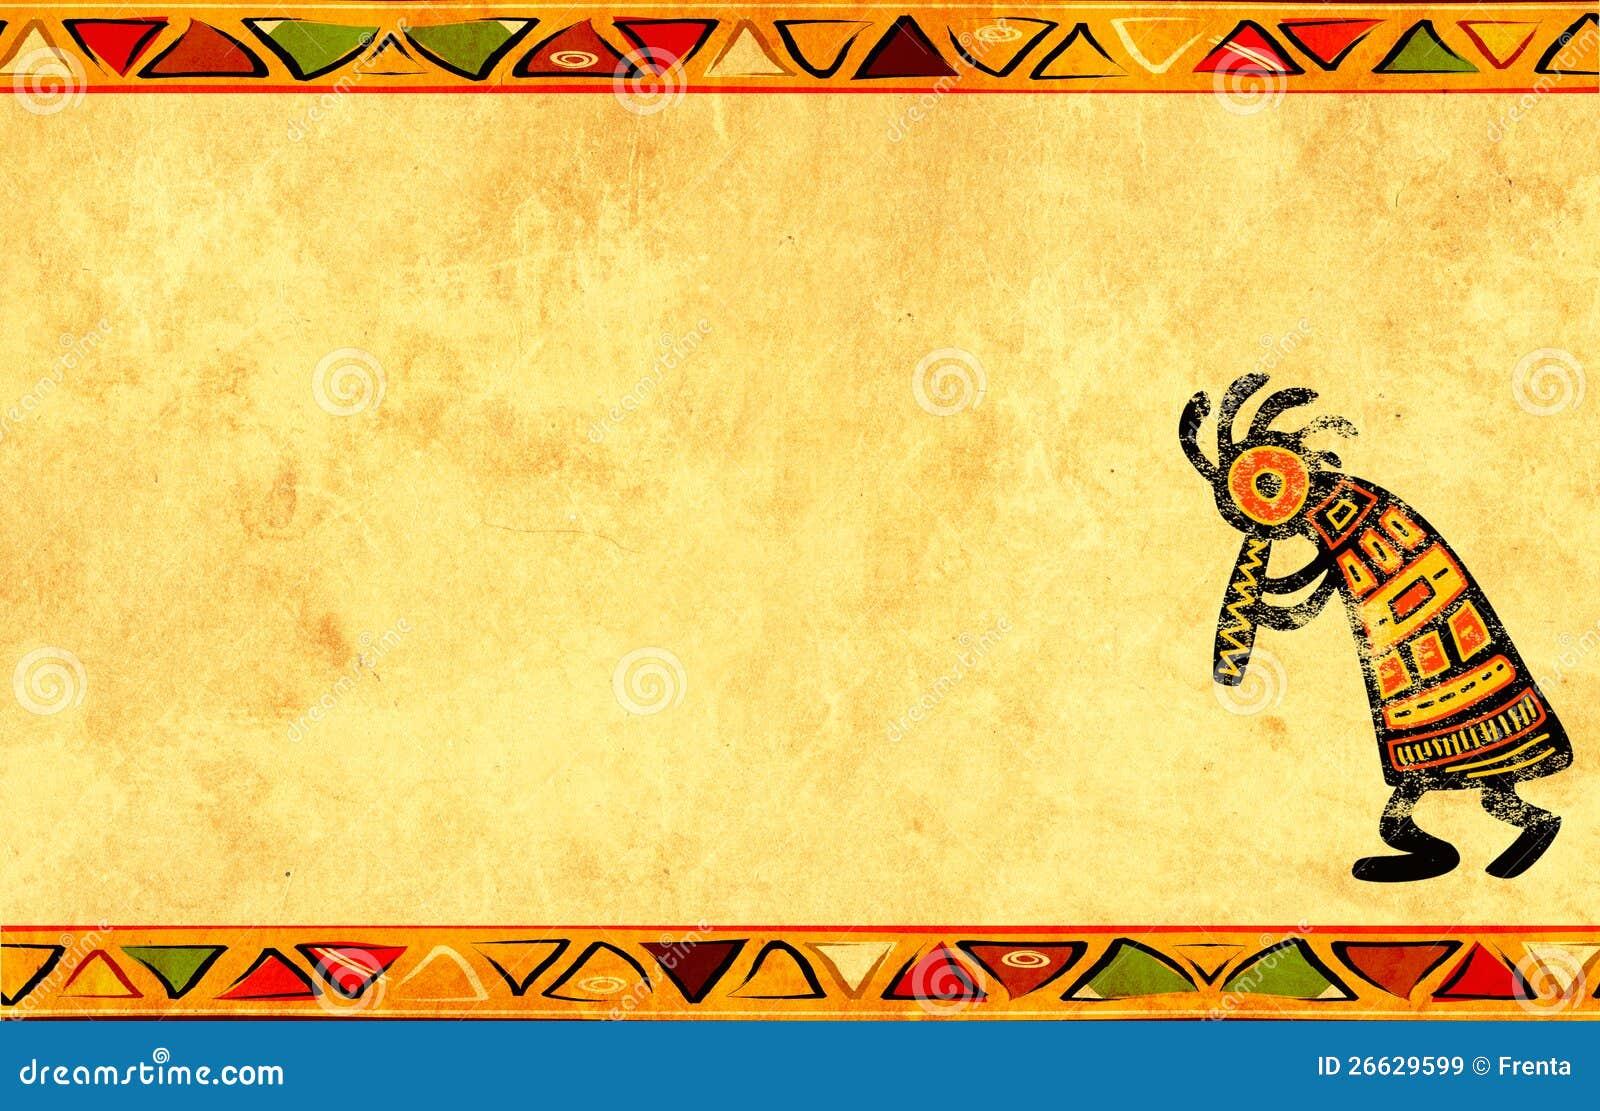 Предпосылка Grunge с африканскими картинами